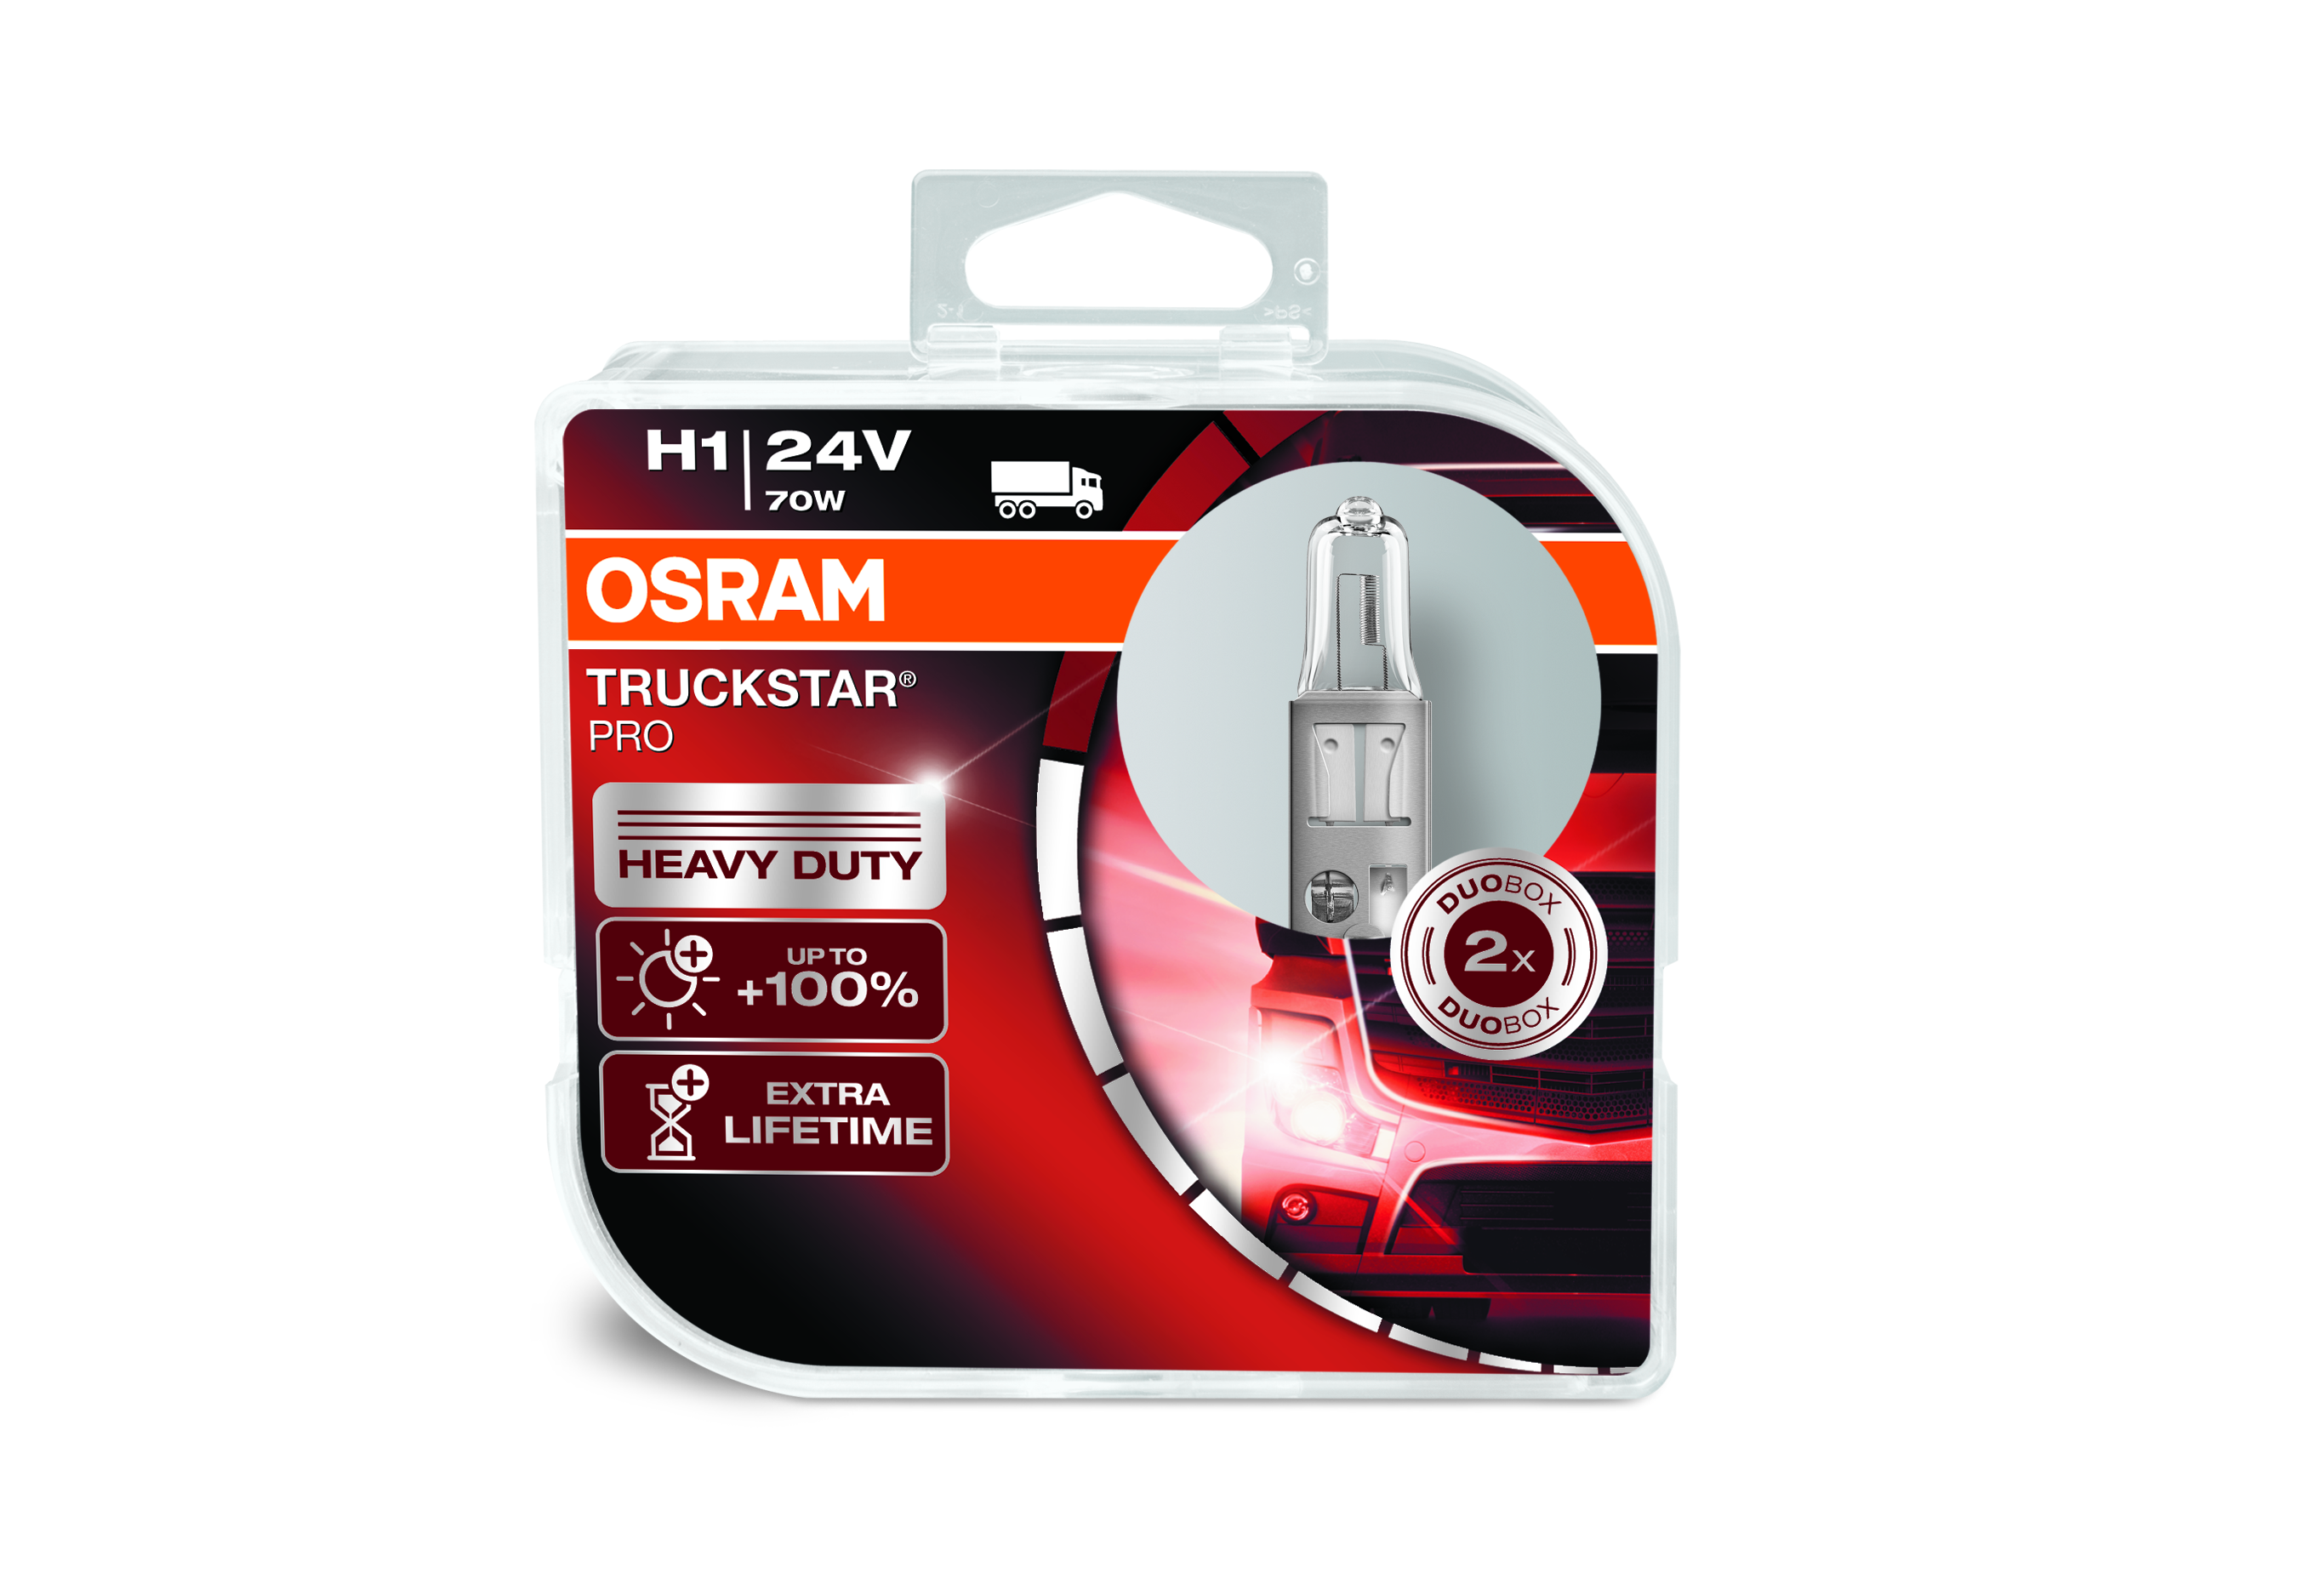 Osram halogenová žárovka, TRUCKSTAR PRO, H1, P14,5s, 24V, 70W, 64155TSP-HCB